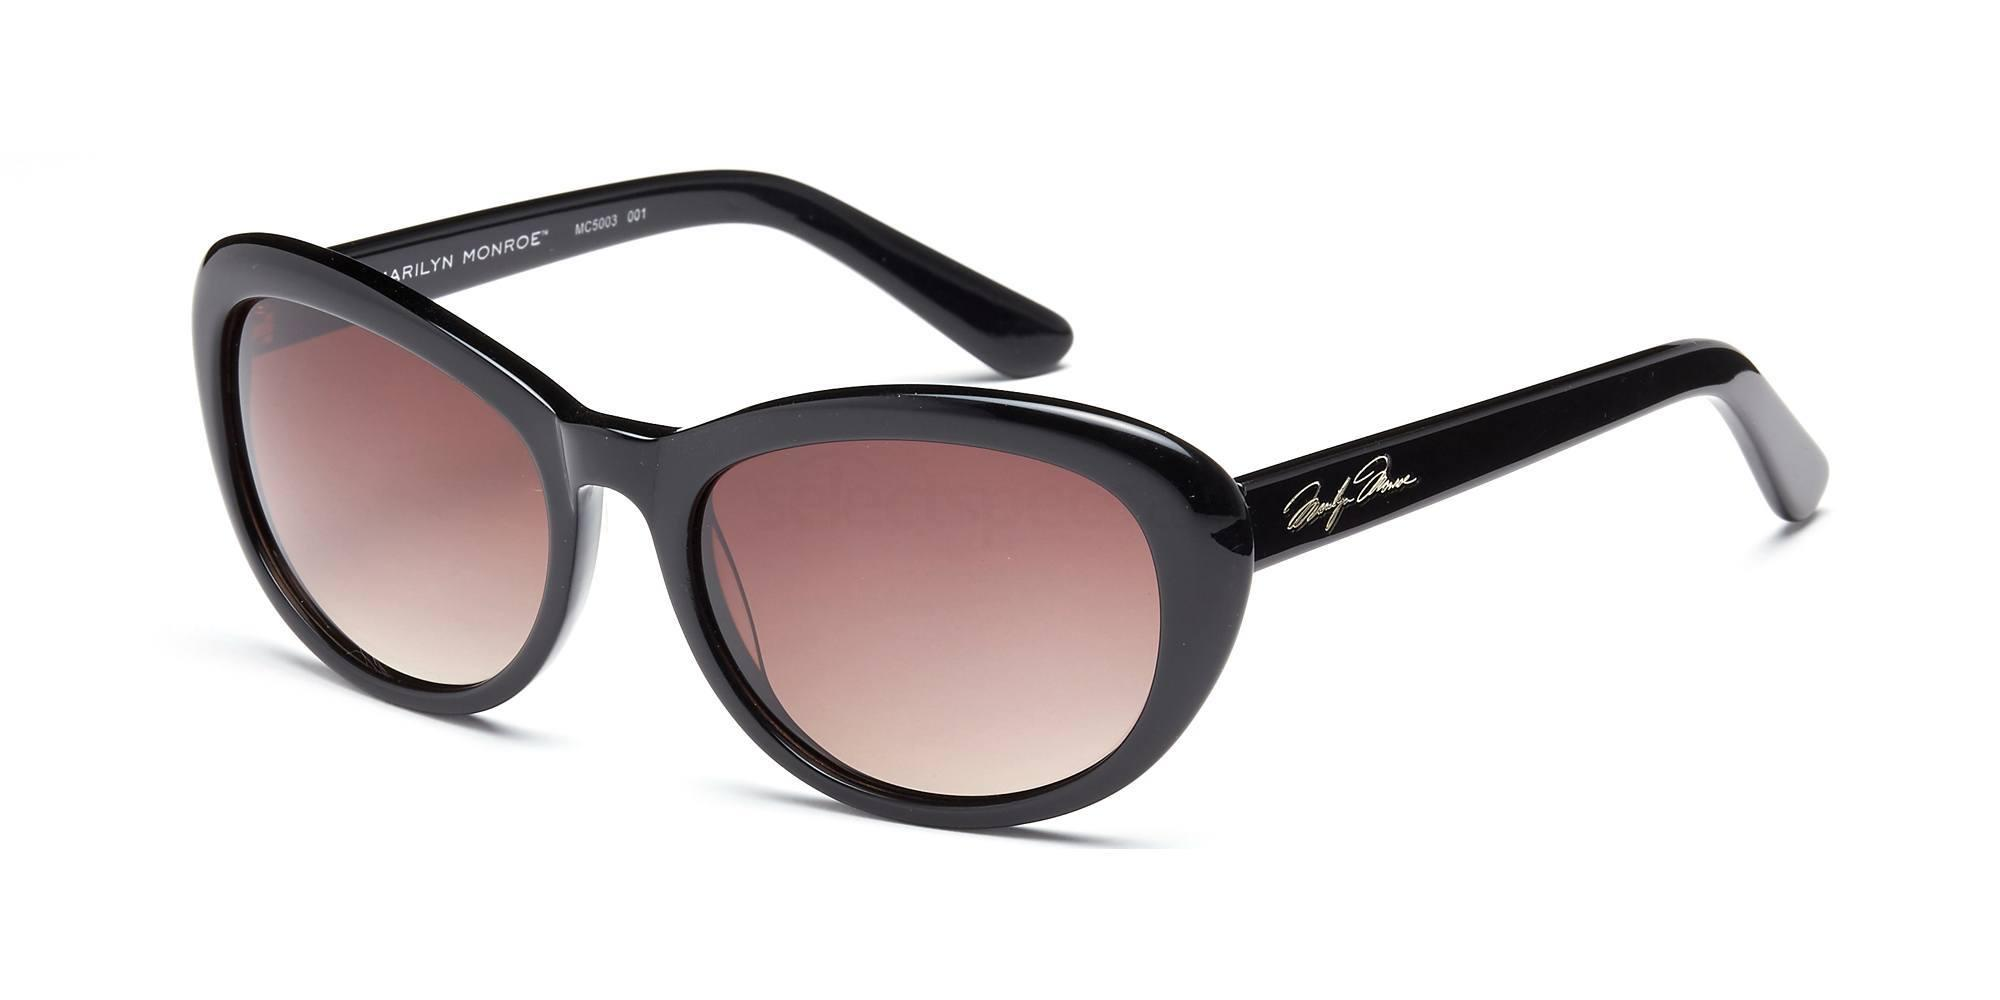 C1 MMS5003 Sunglasses, Marilyn Monroe